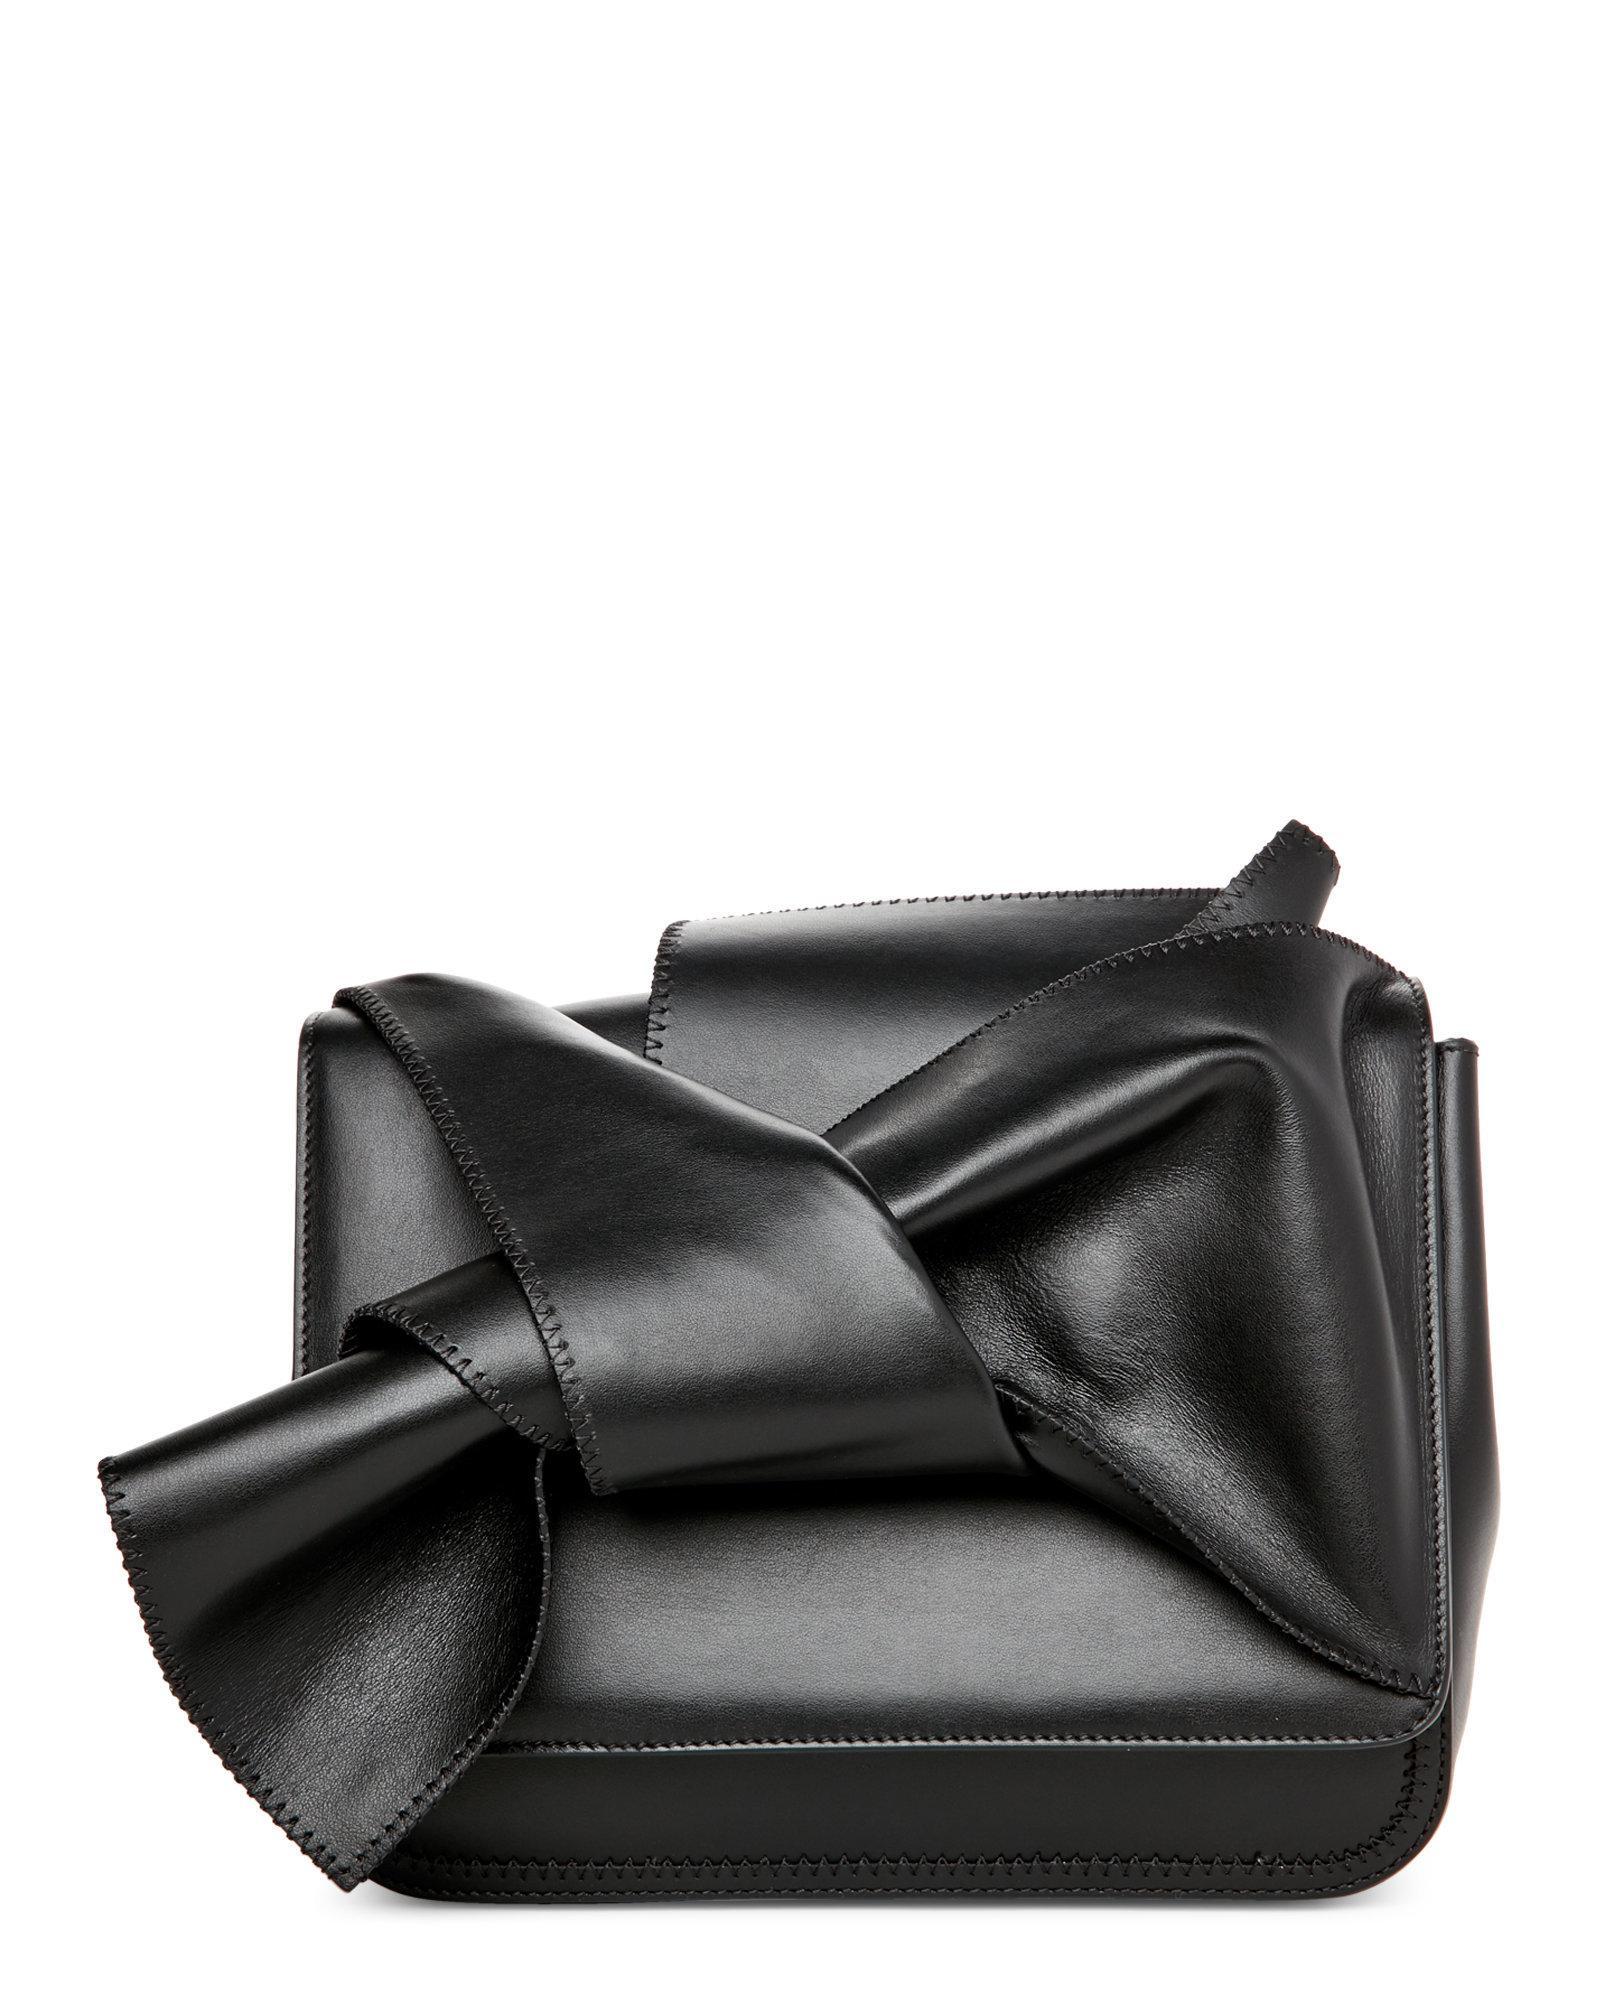 Cheap Sale Online Bow Shoulder Bag in Black Calfskin N°21 Buy Cheap Best Seller Discount 2018 Newest Buy Cheap Cheap Best Place To Buy Online upKBAd